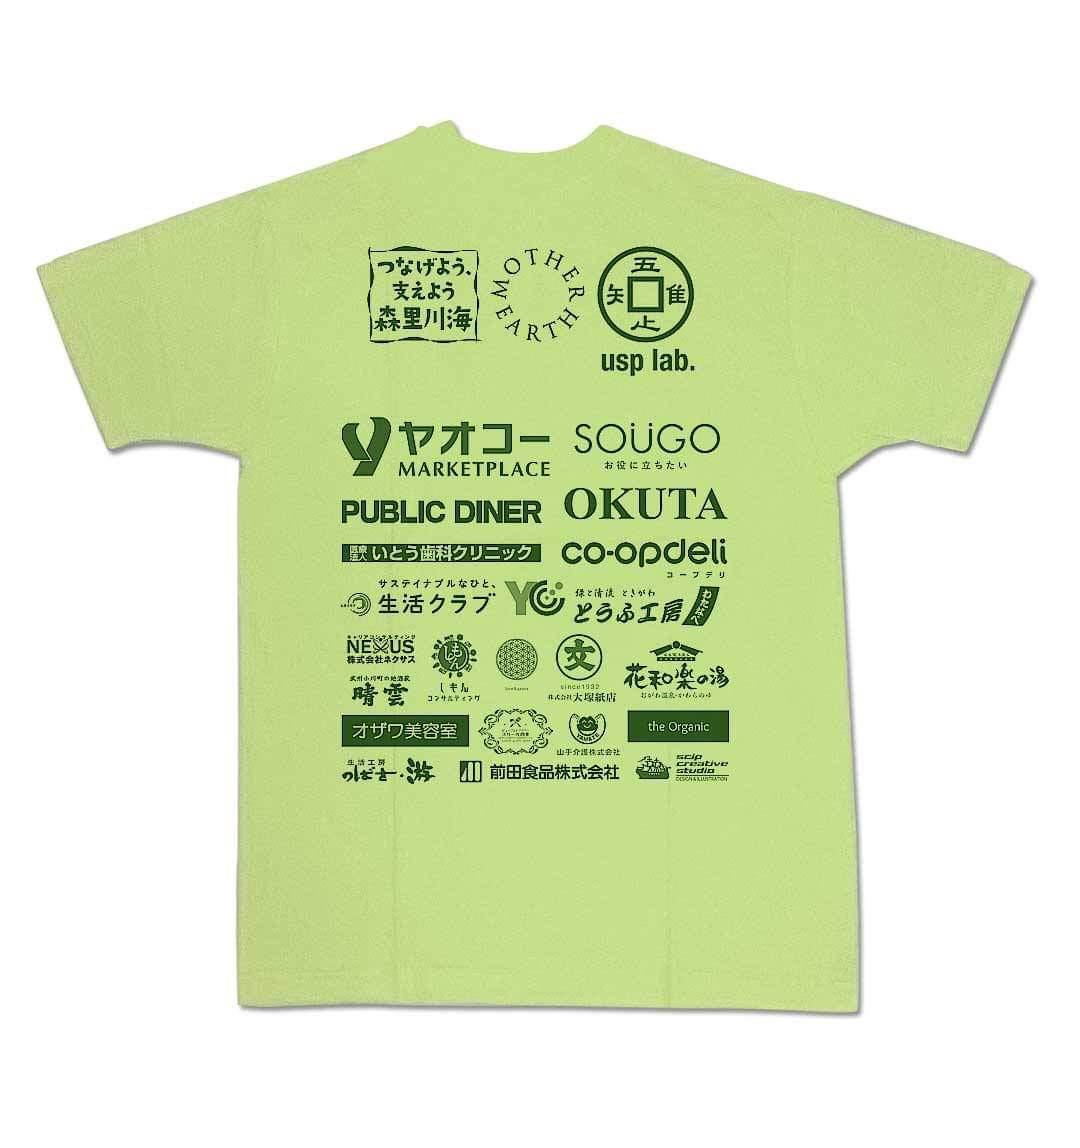 Fes19協賛Tシャツ背面決定